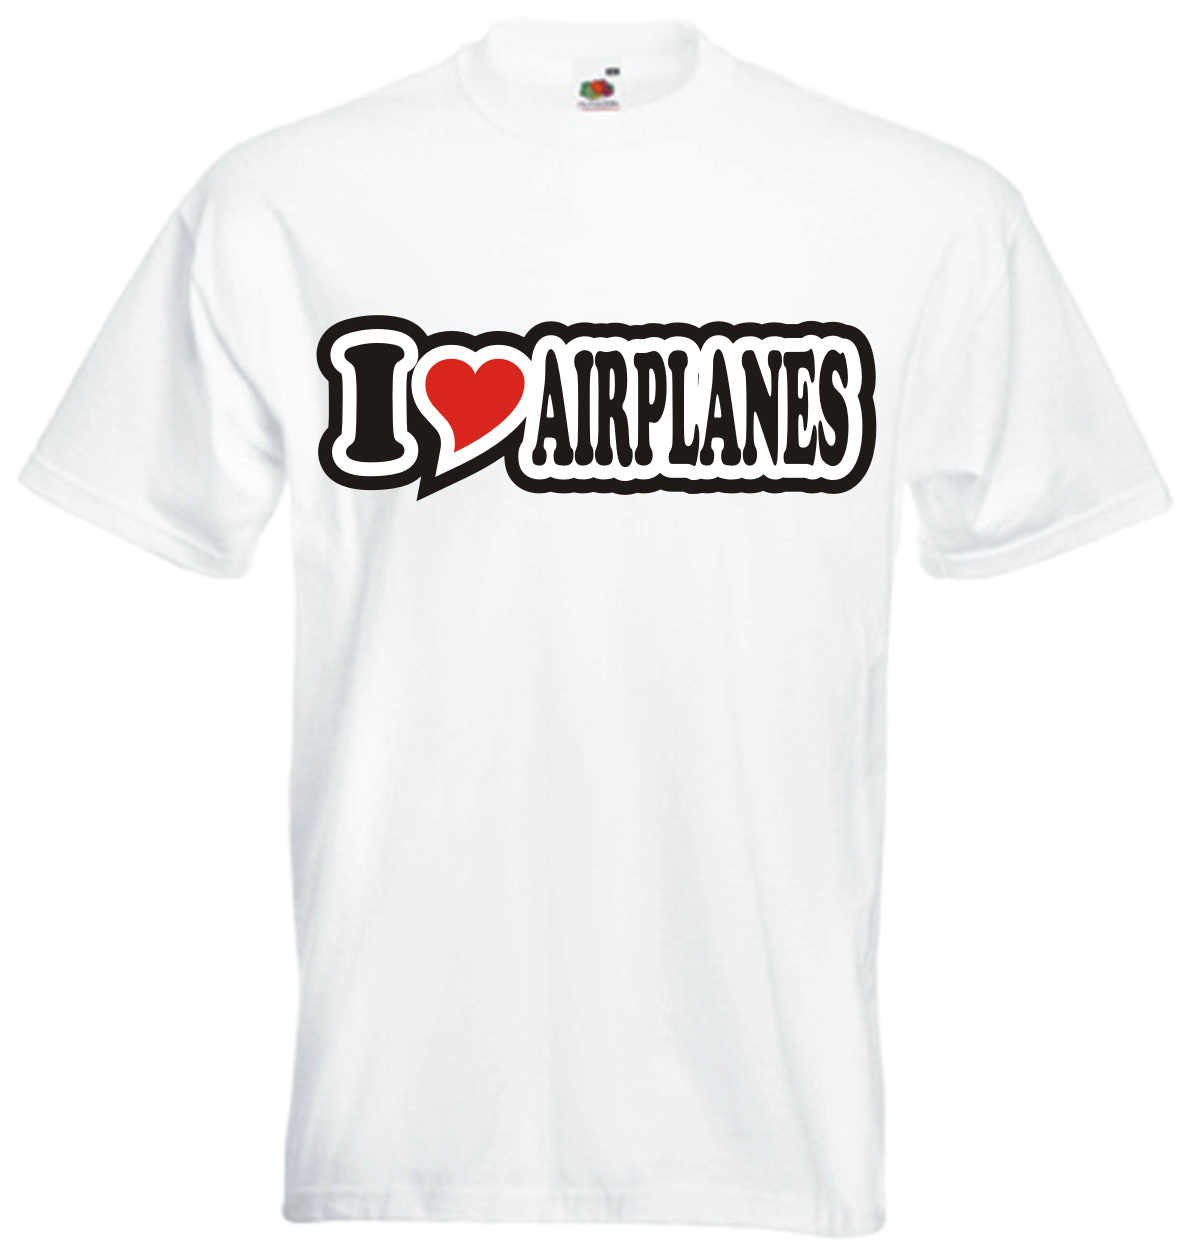 I Love Heart T-Shirt Men I LOVE AIRPLANES Black Dragon